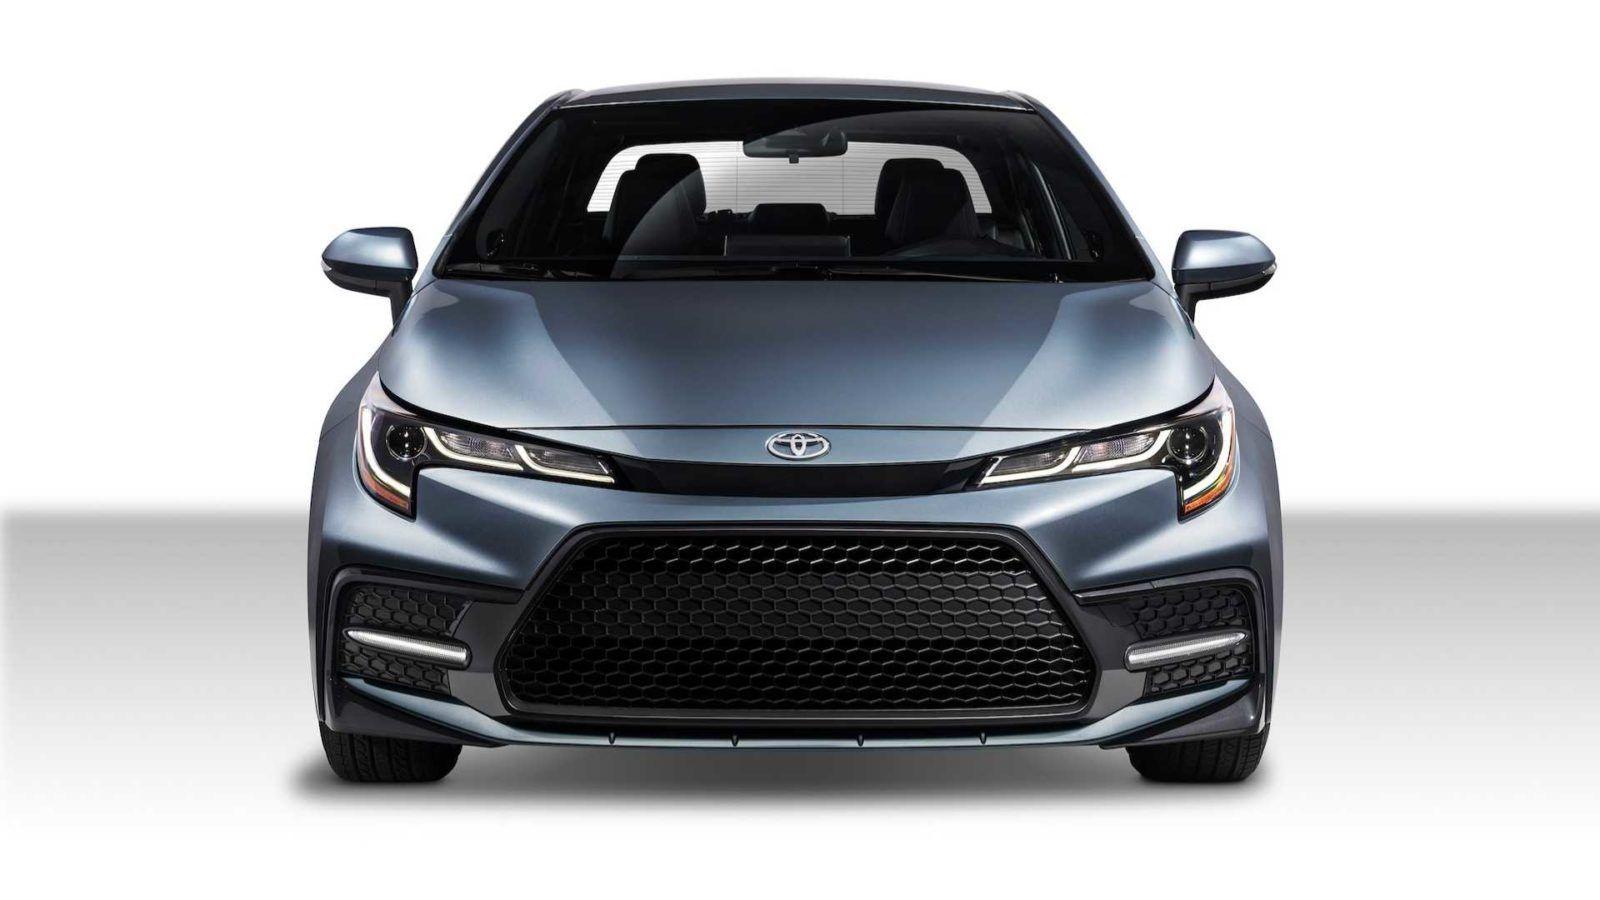 Toyota Corolla 2020 Exterior In Pakistan Release Date